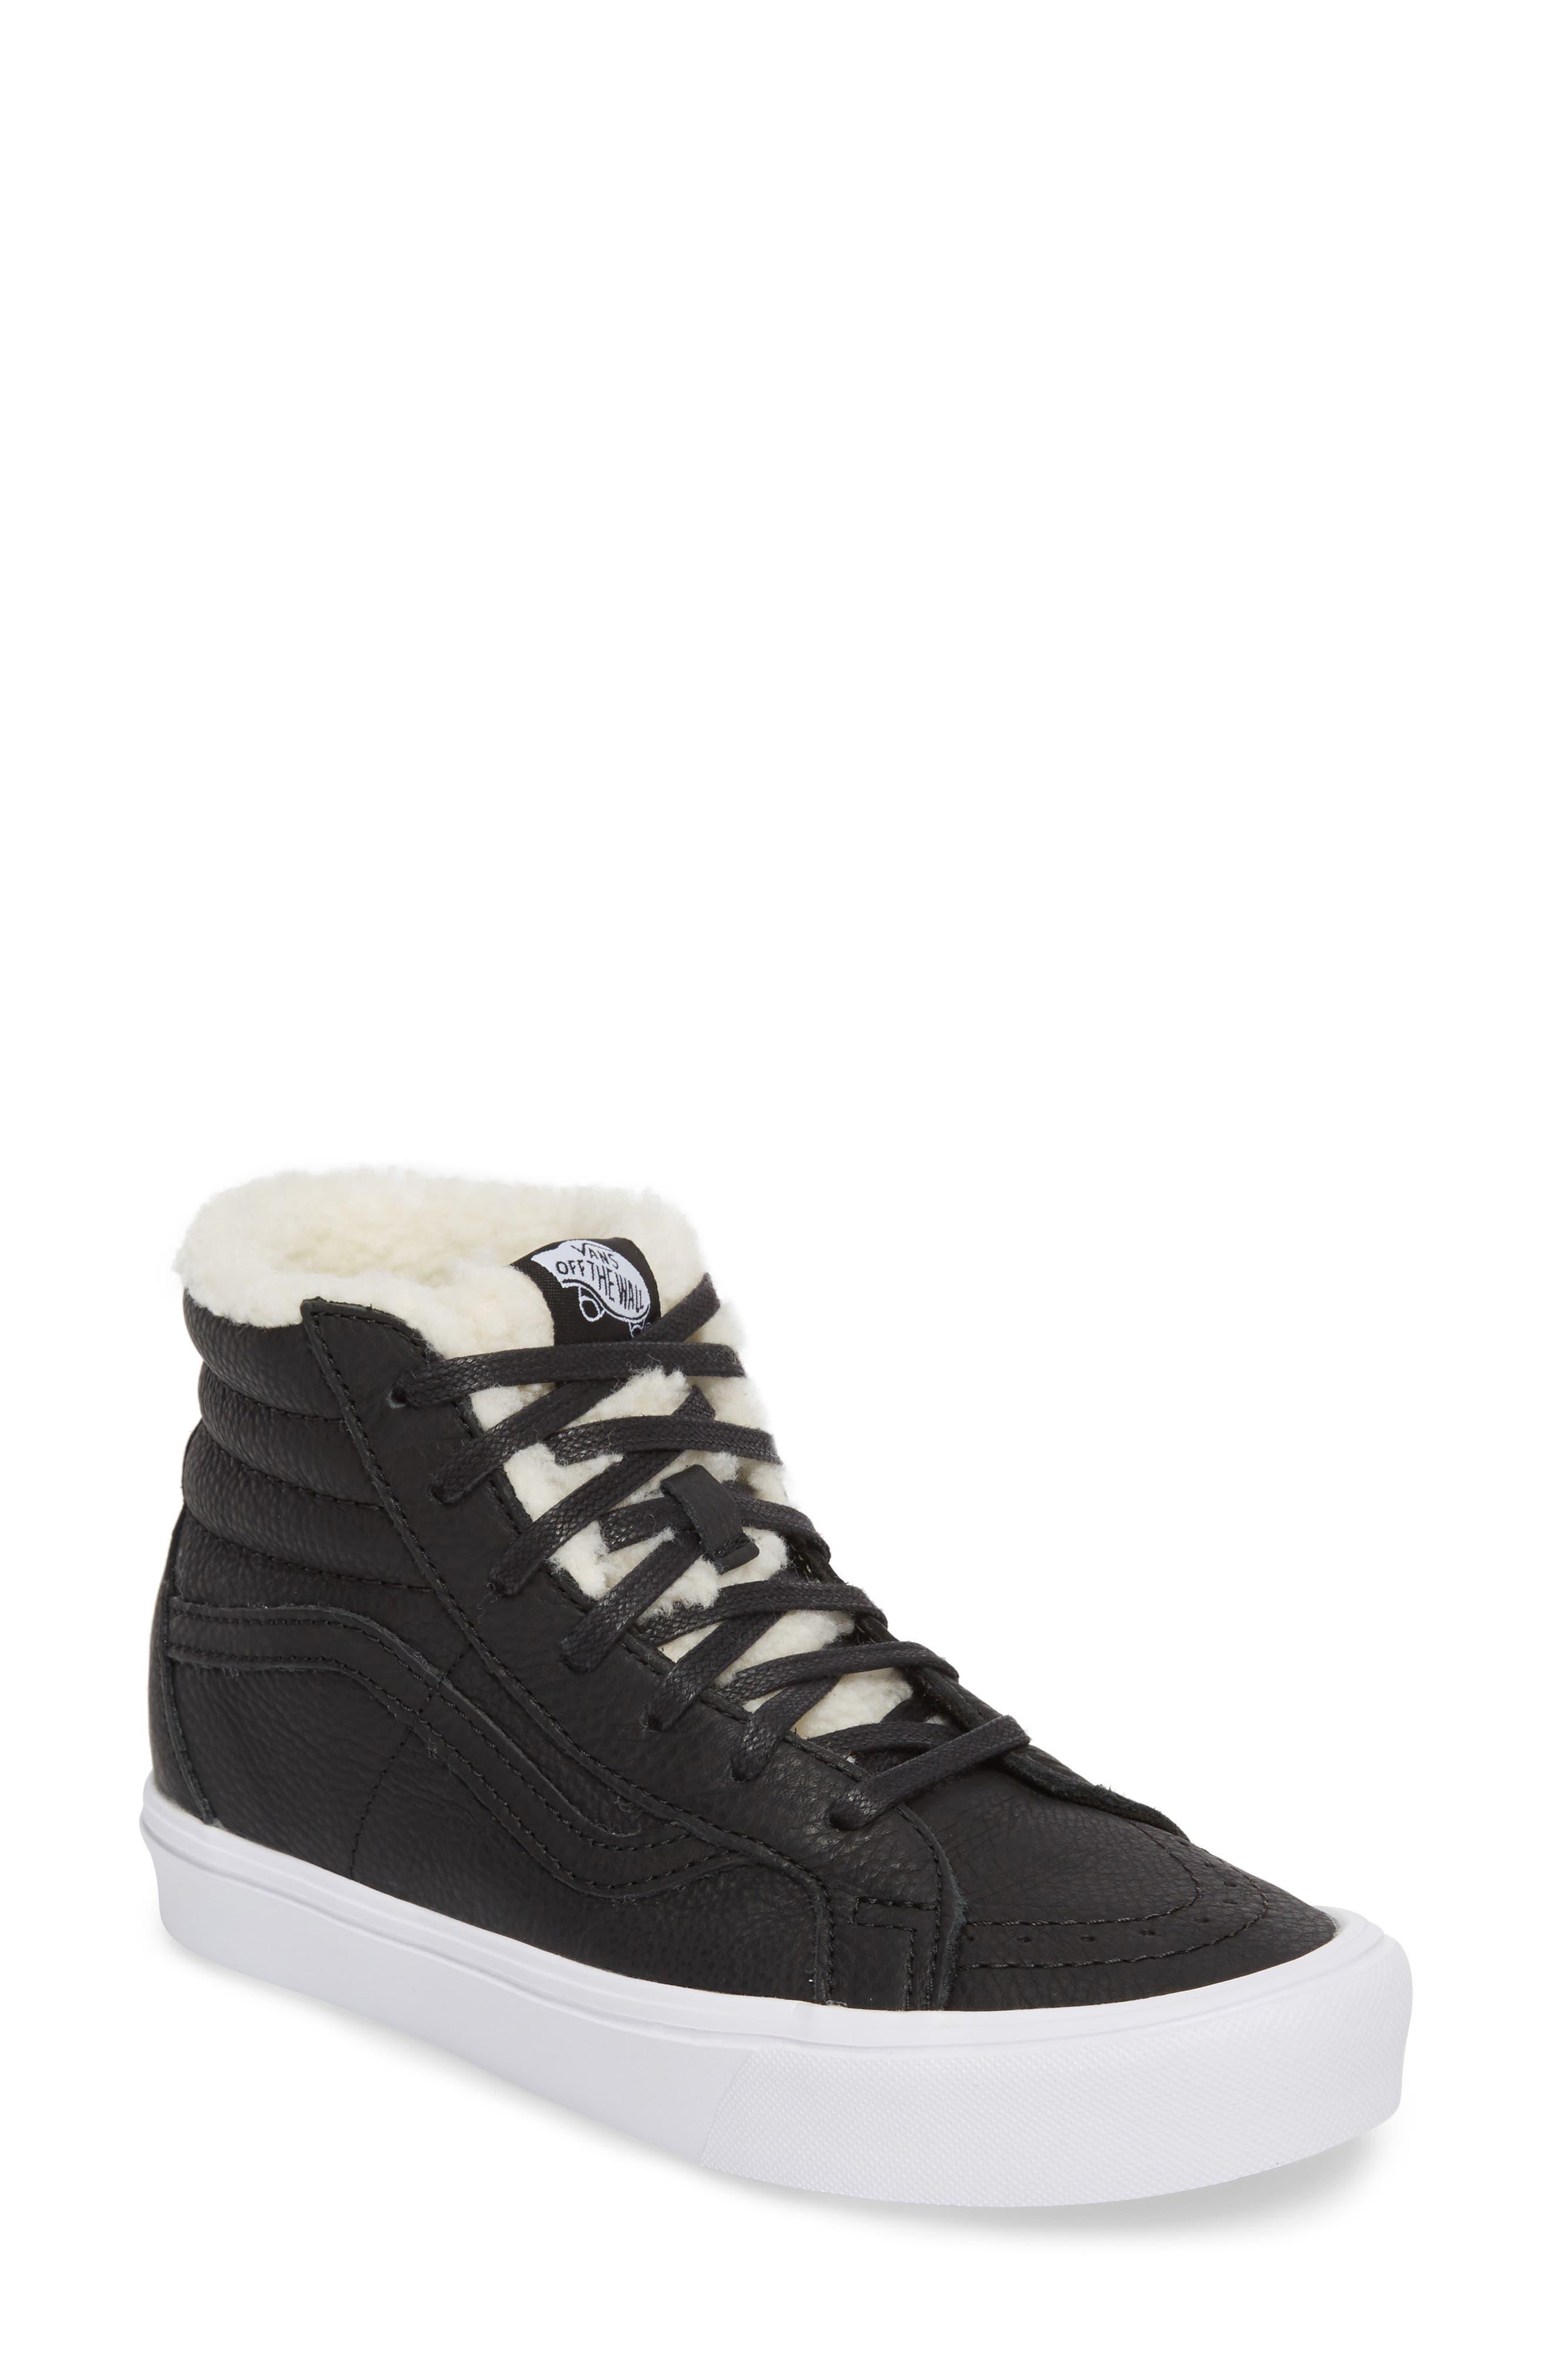 Sk8-Hi Reissue Lite High Top Sneaker,                             Main thumbnail 1, color,